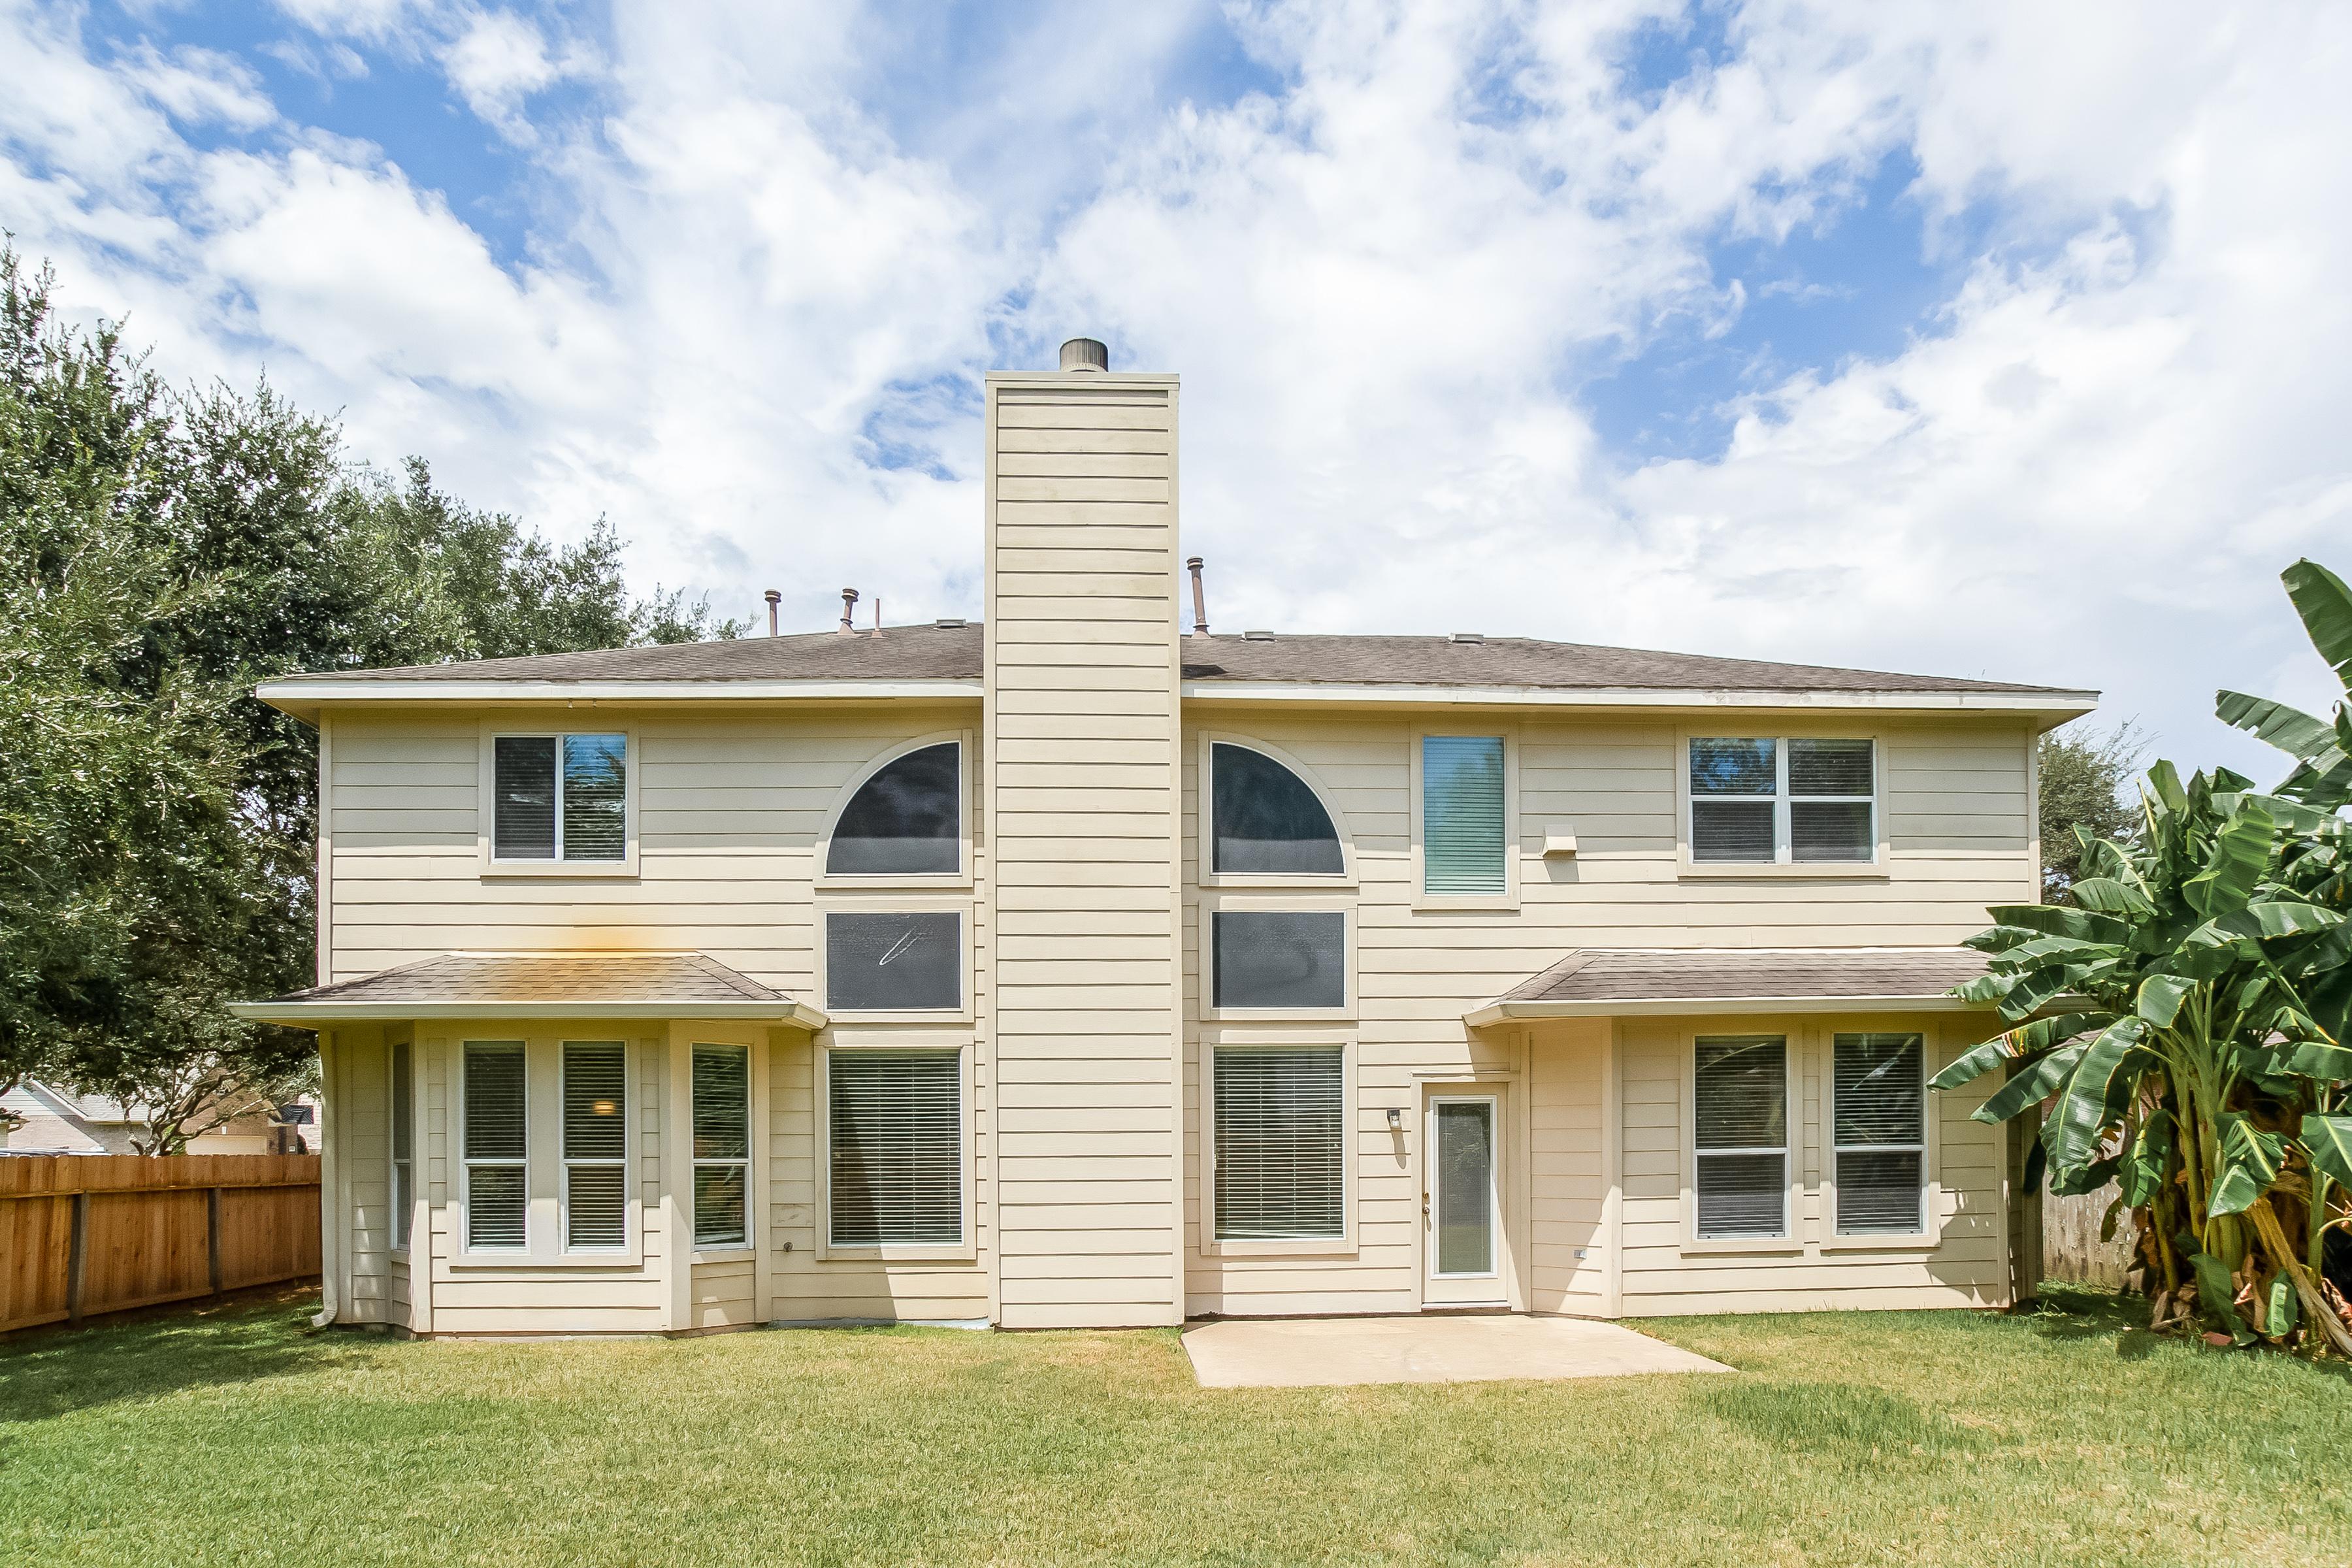 Photo of 10402 Five Oaks Court, Missouri City, TX 77459